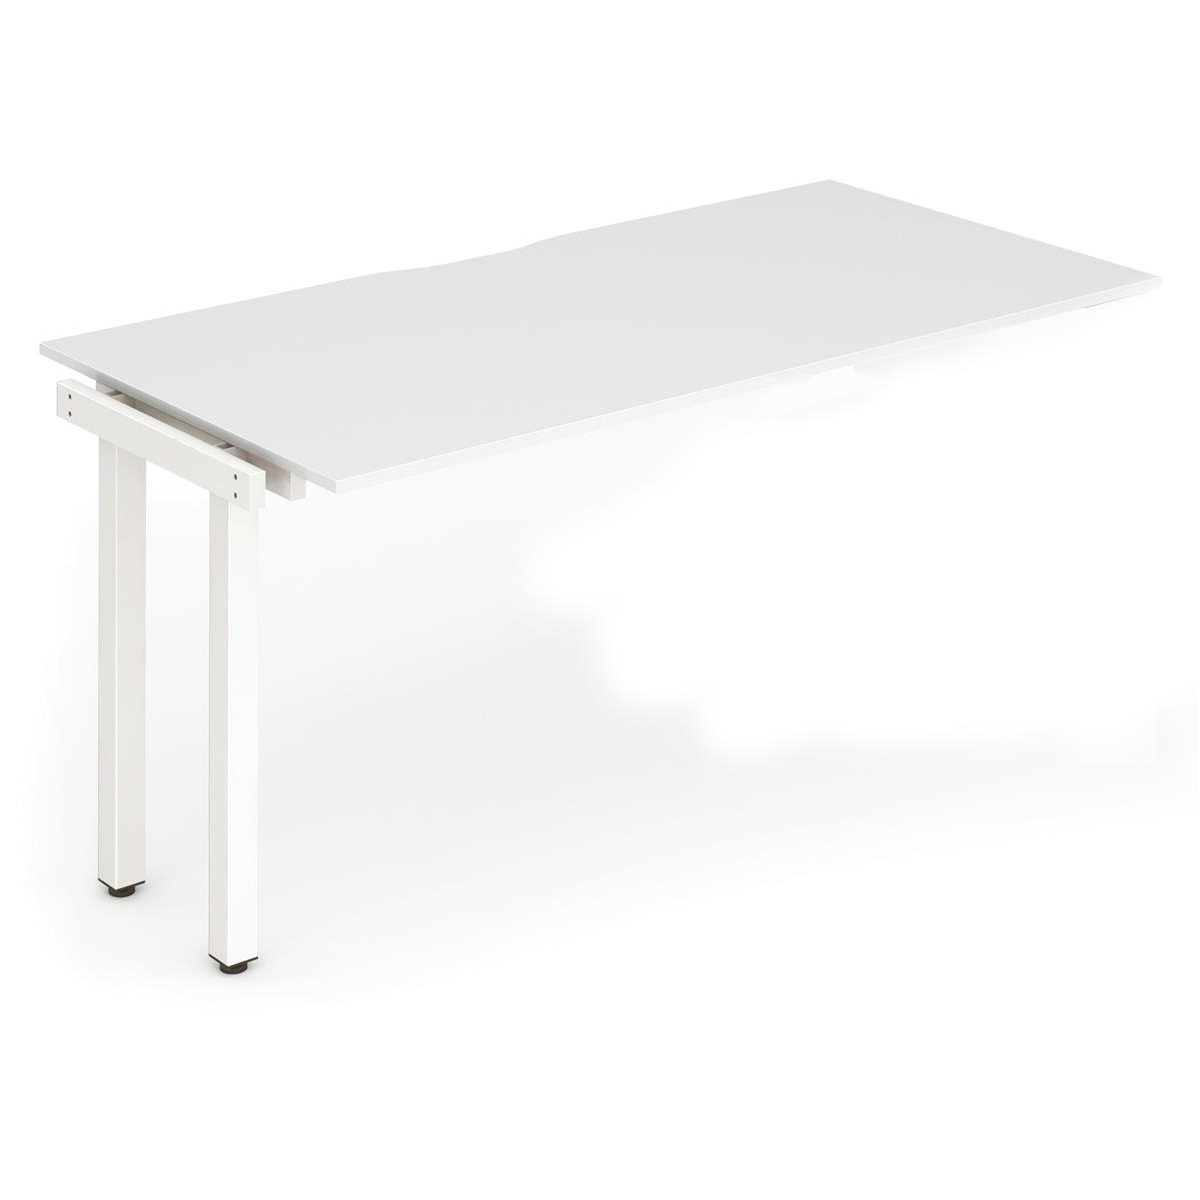 Trexus Bench Desk Single Extension White Leg 1600x800mm White Ref BE310